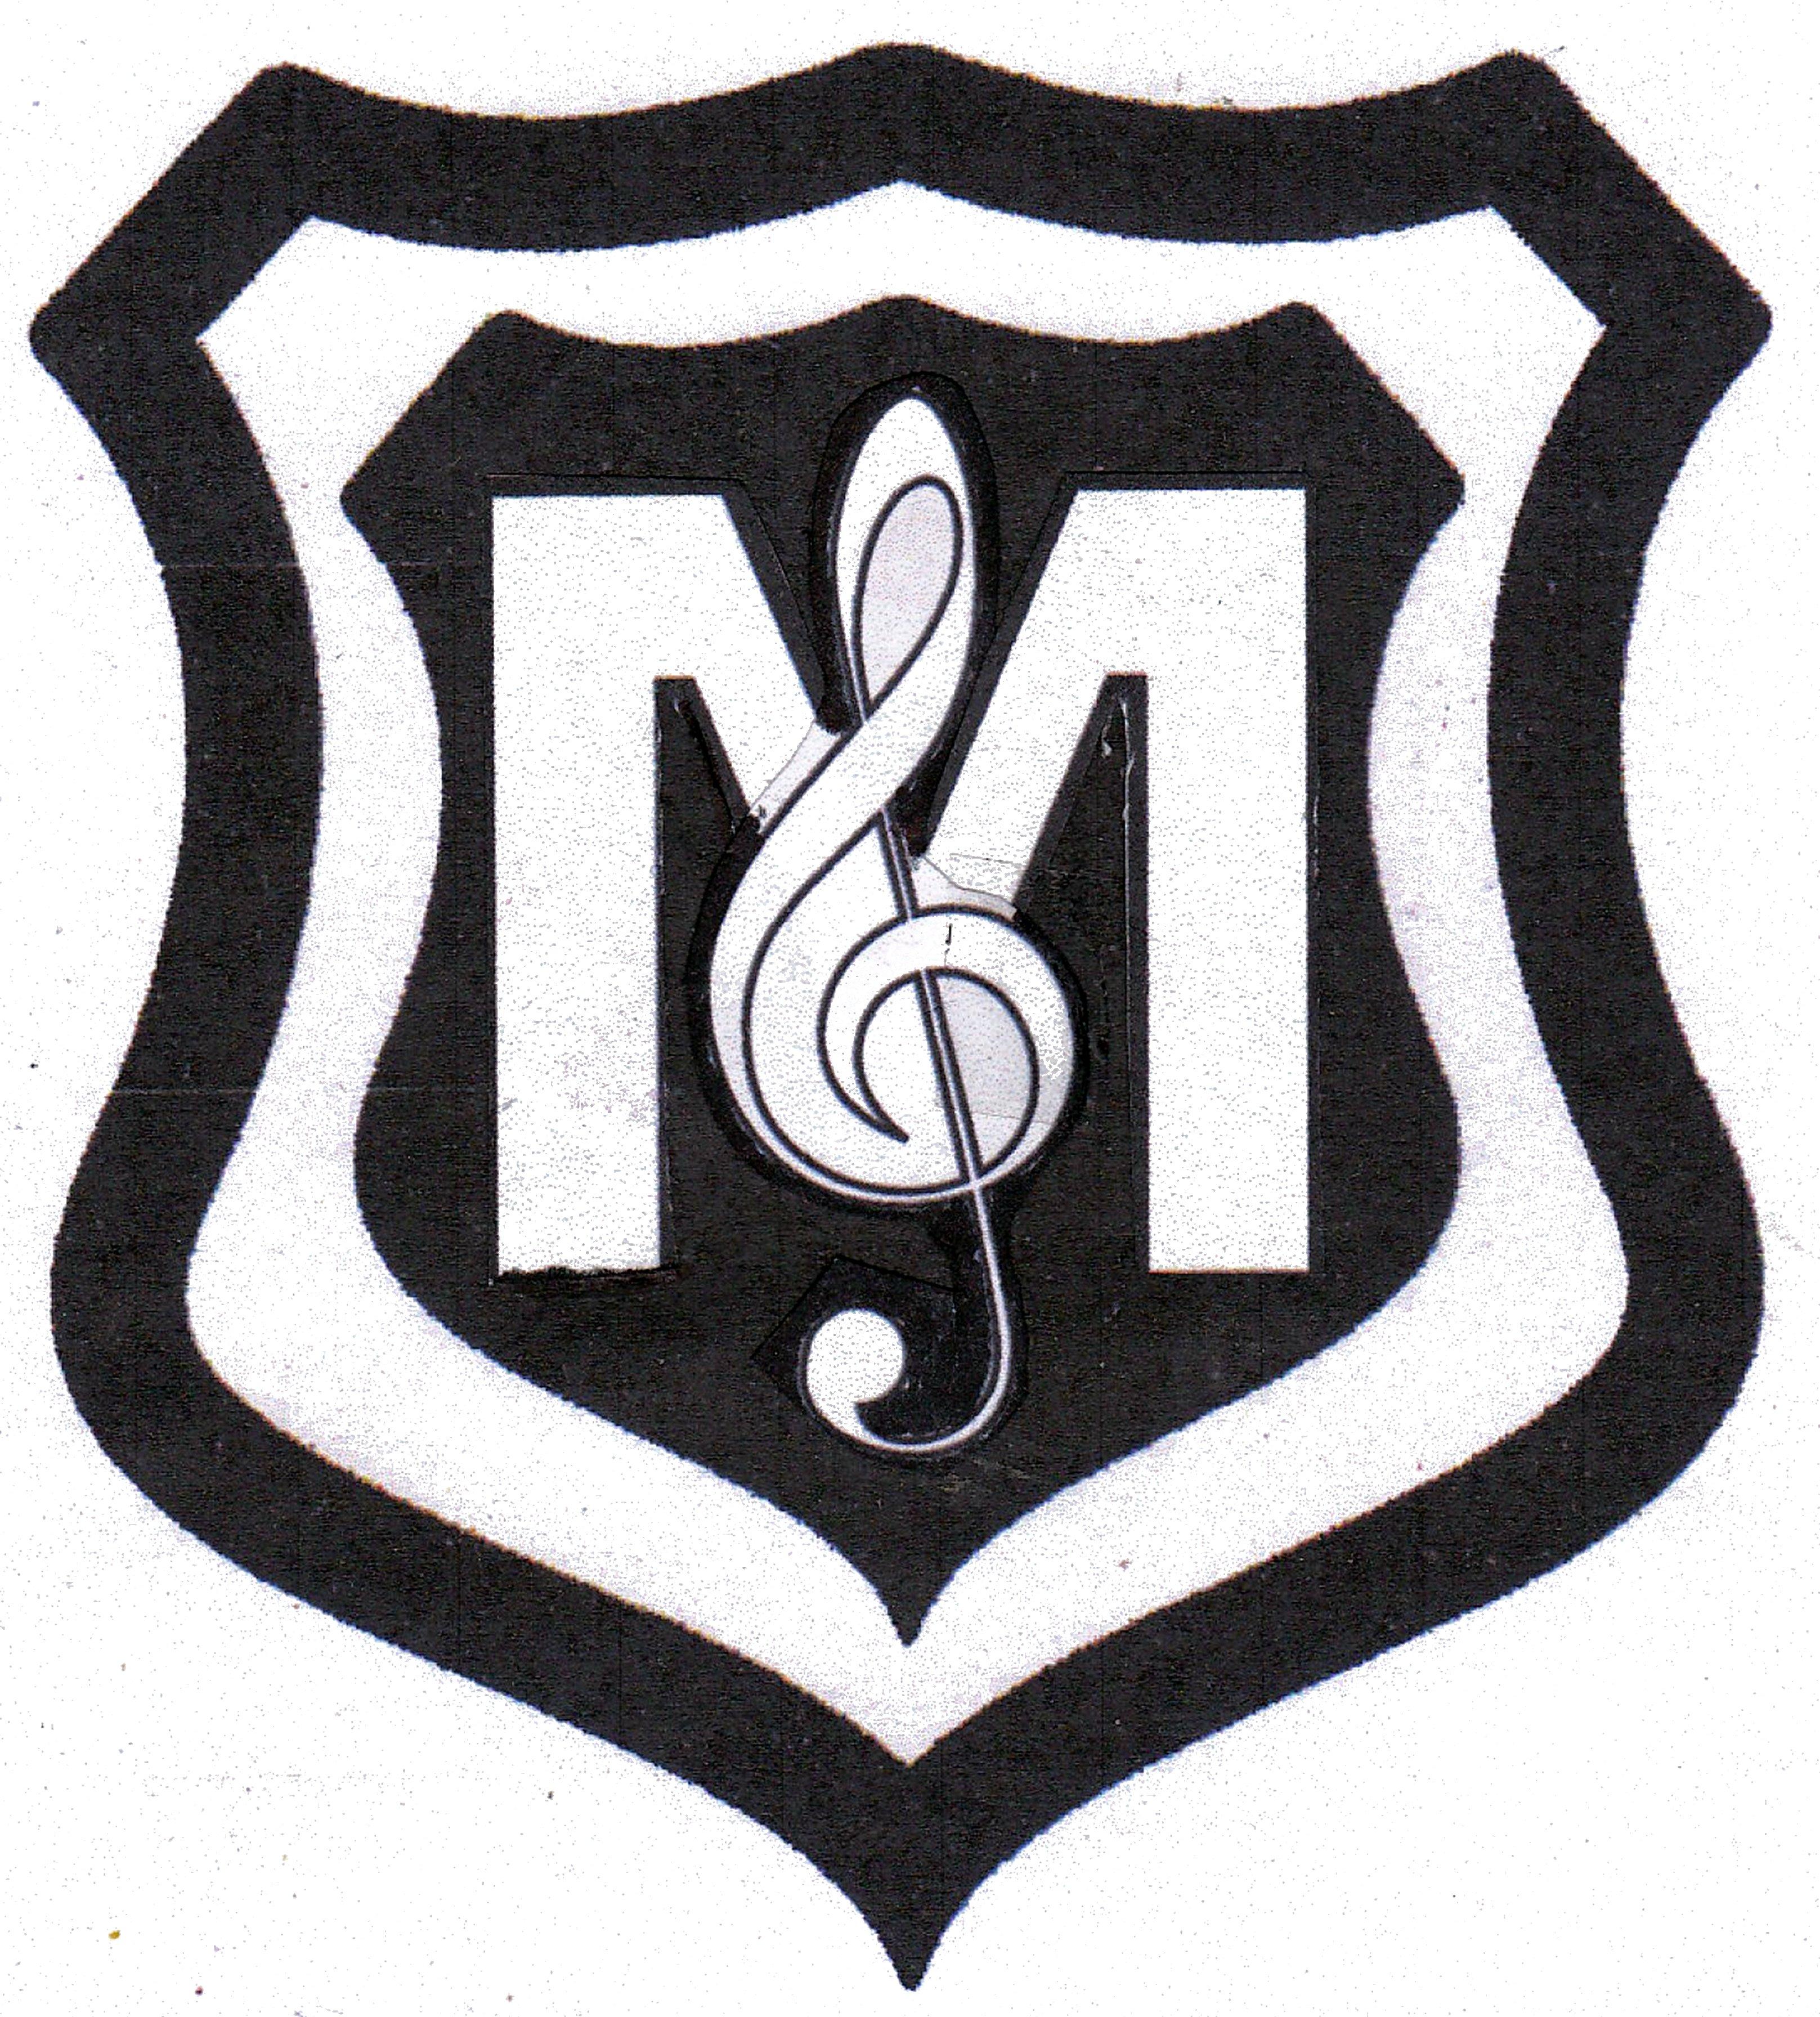 Maxheat